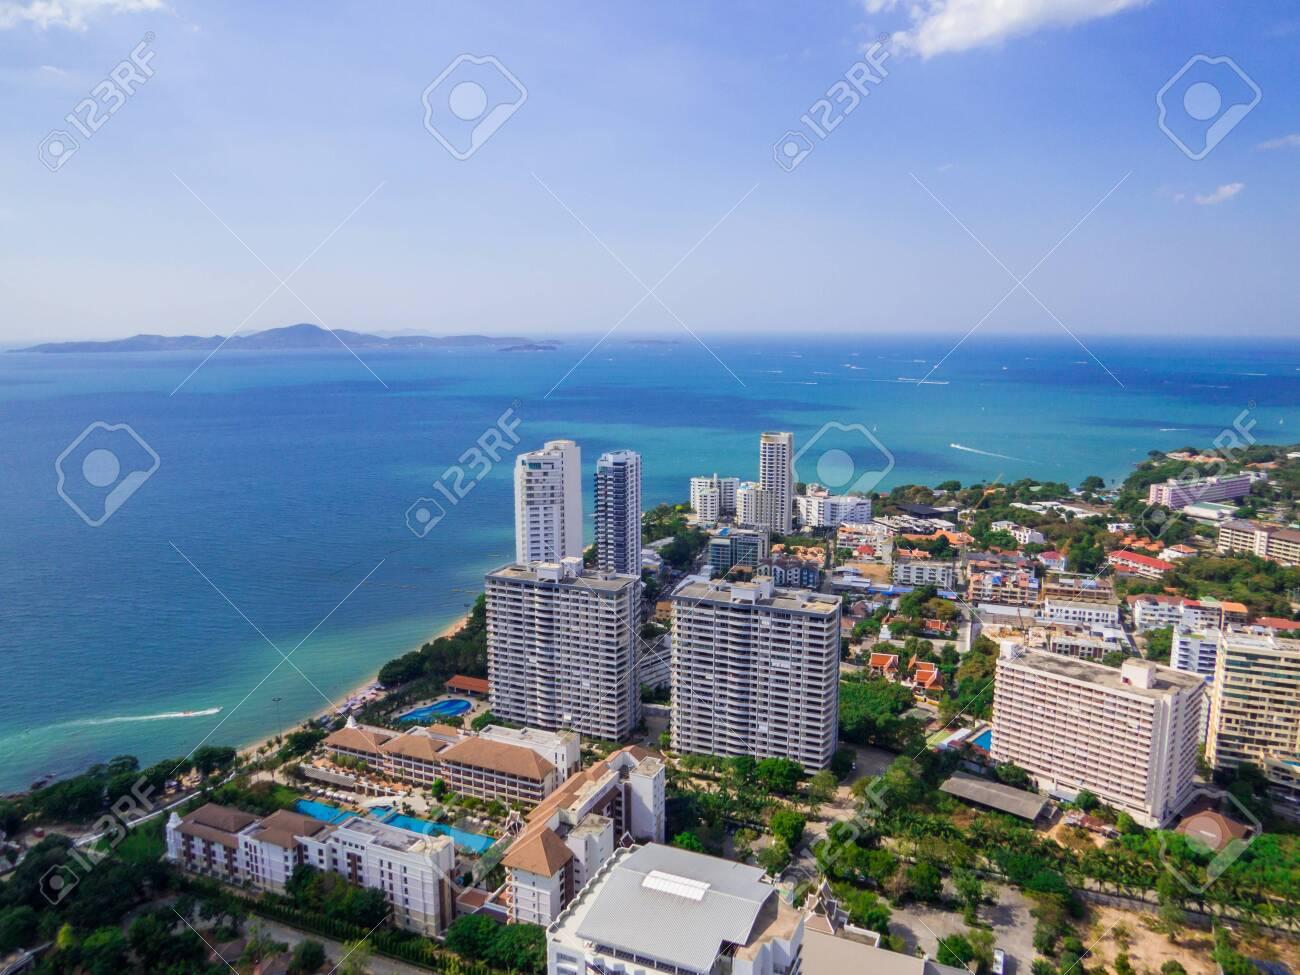 Aerial view of Pattaya, Thailand - 151391492